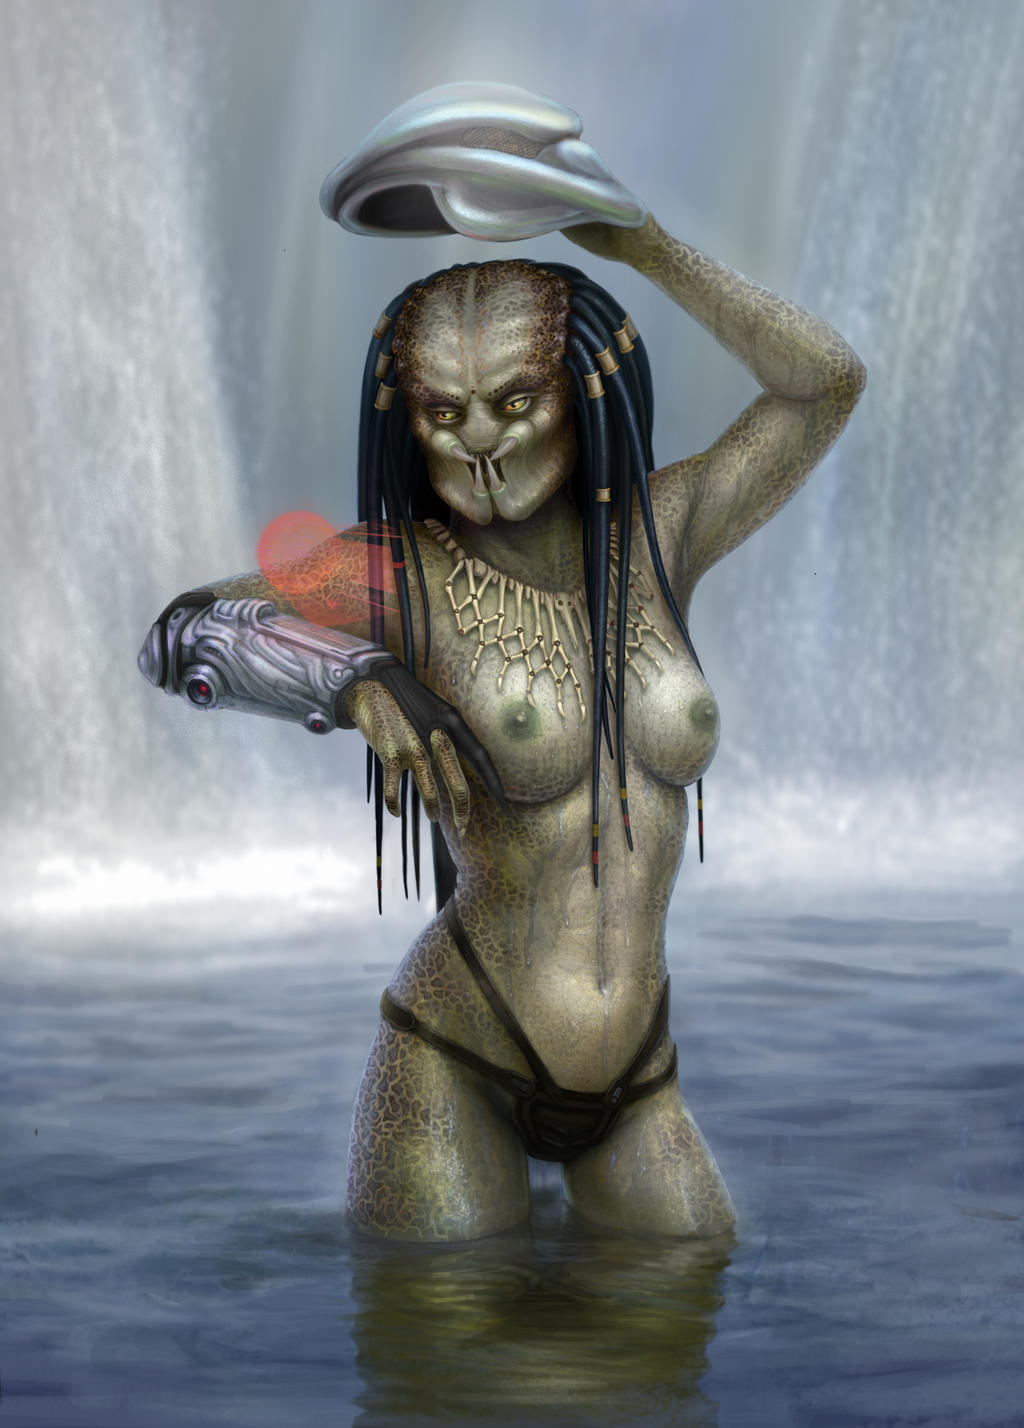 Predator girl in nuket picture can